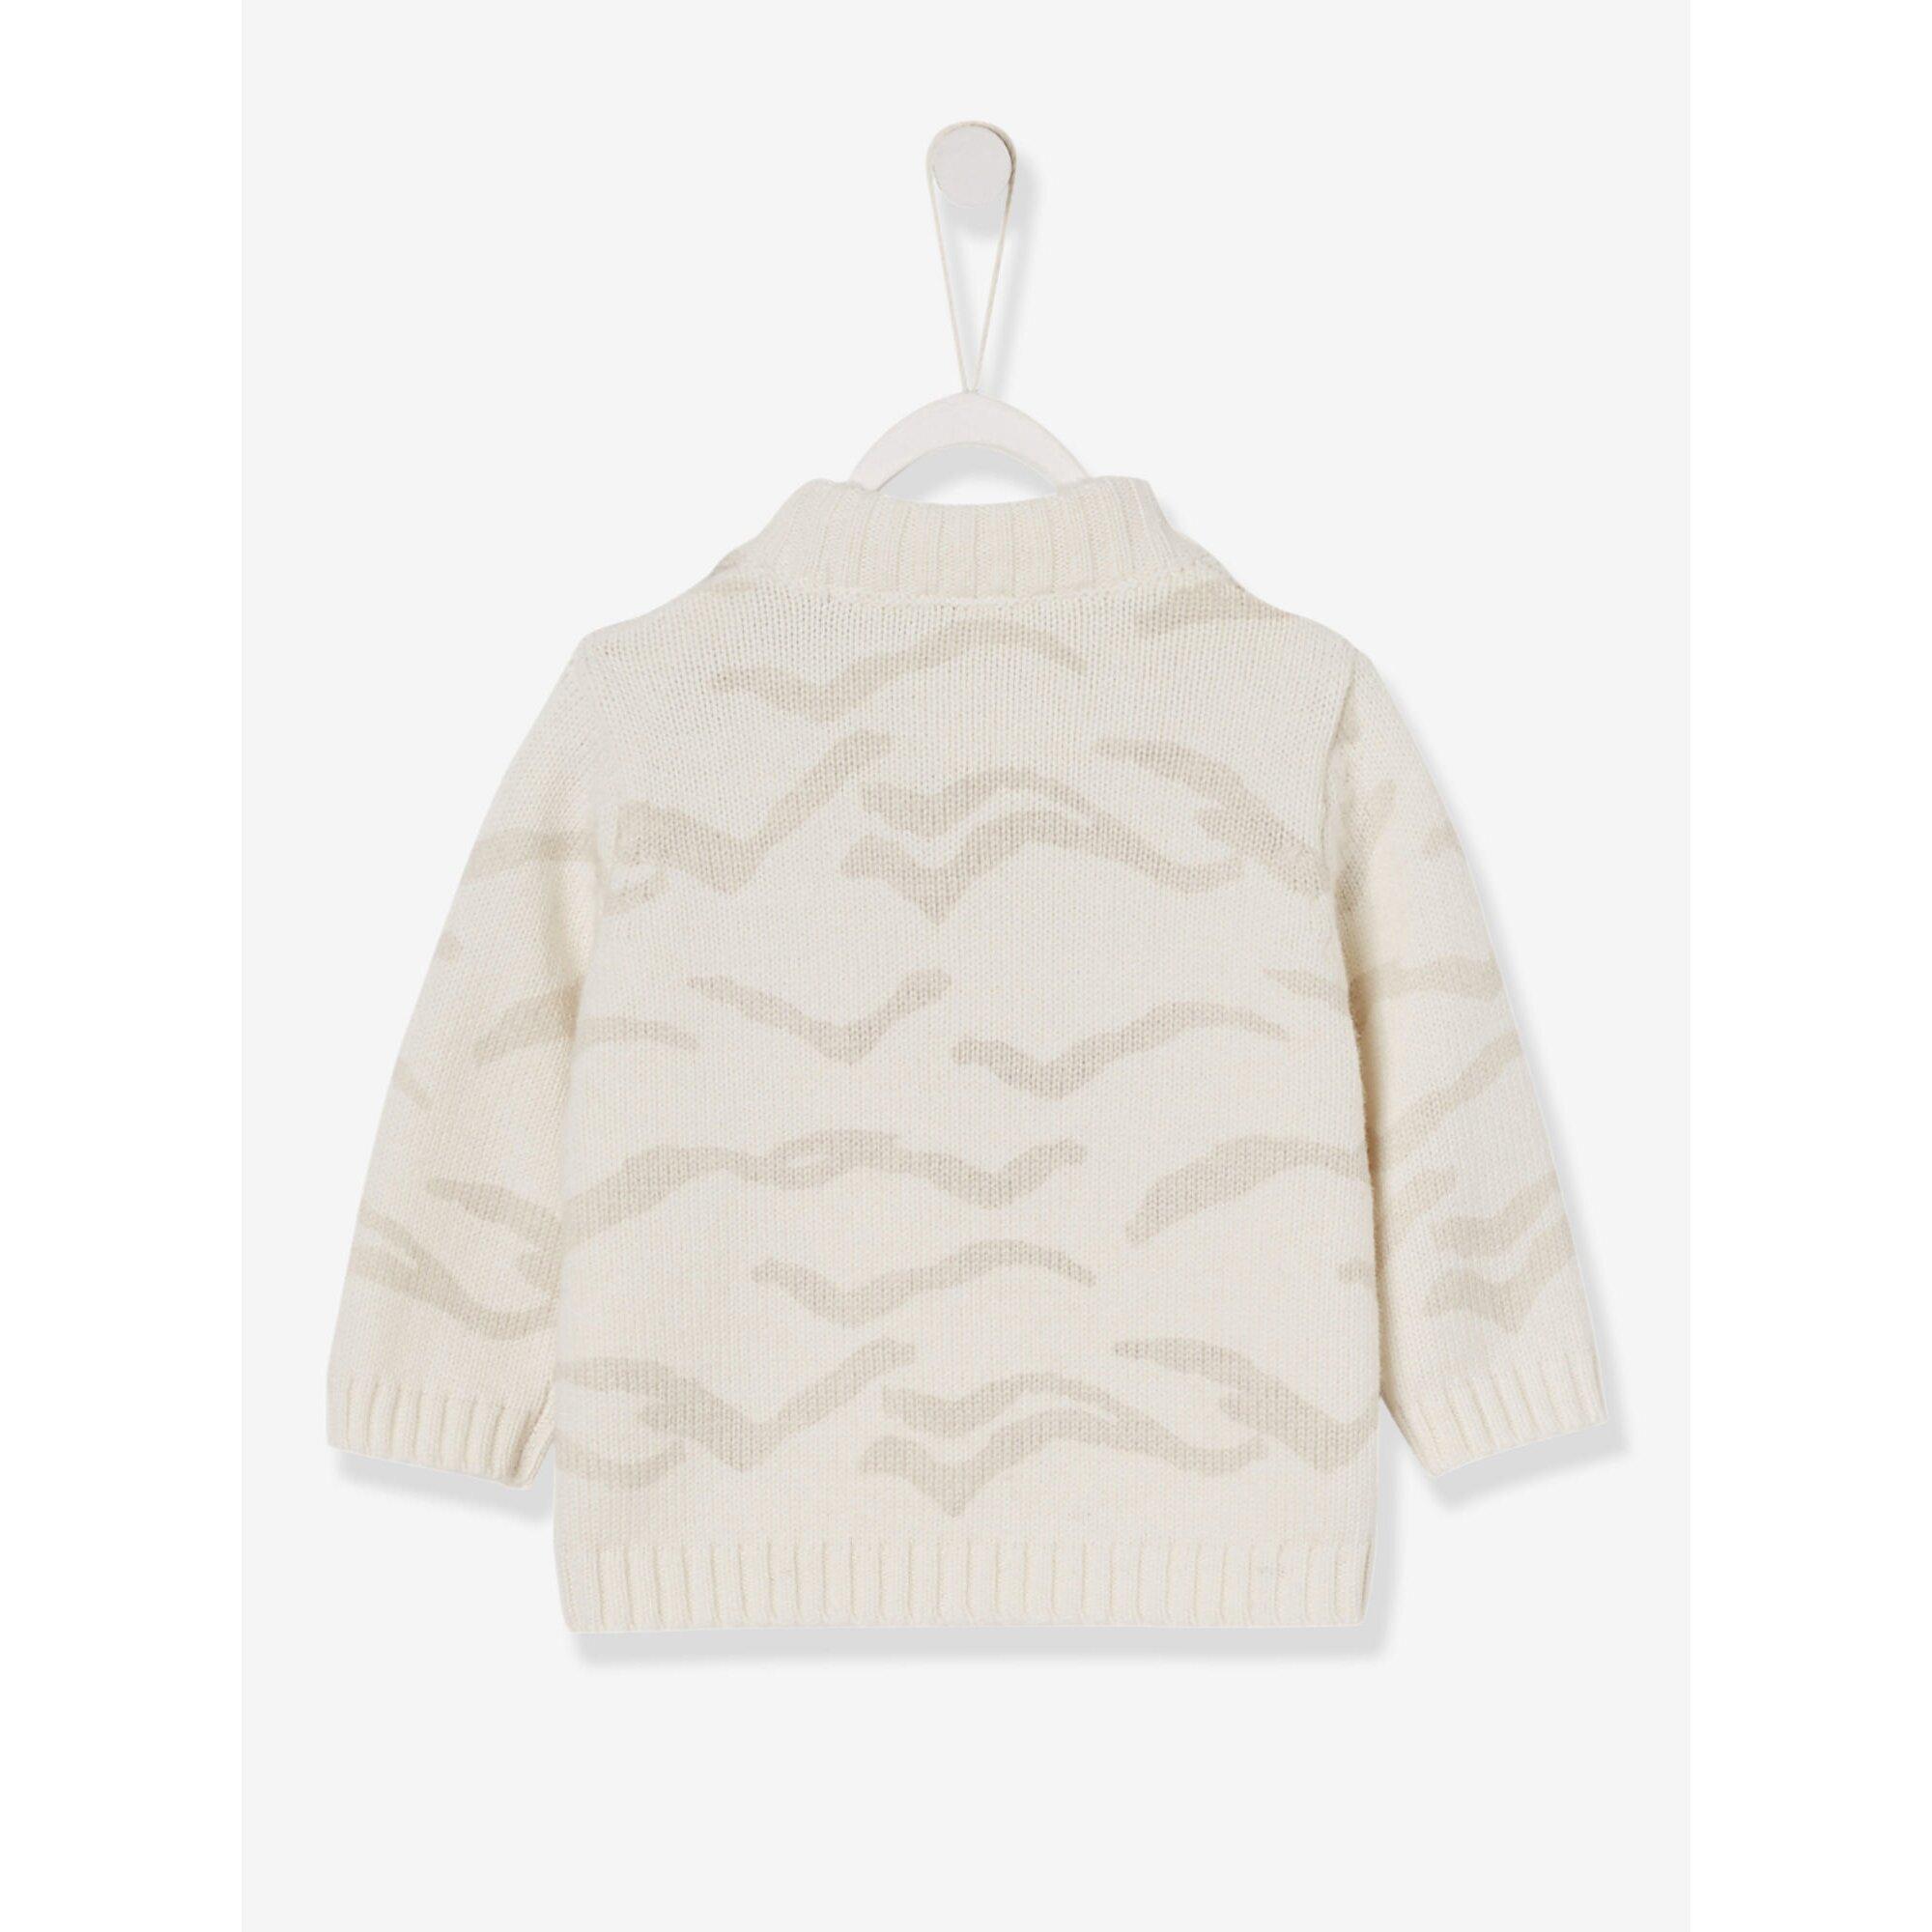 vertbaudet-strick-pullover-fur-baby-jungen-kragen, 20.99 EUR @ babywalz-de